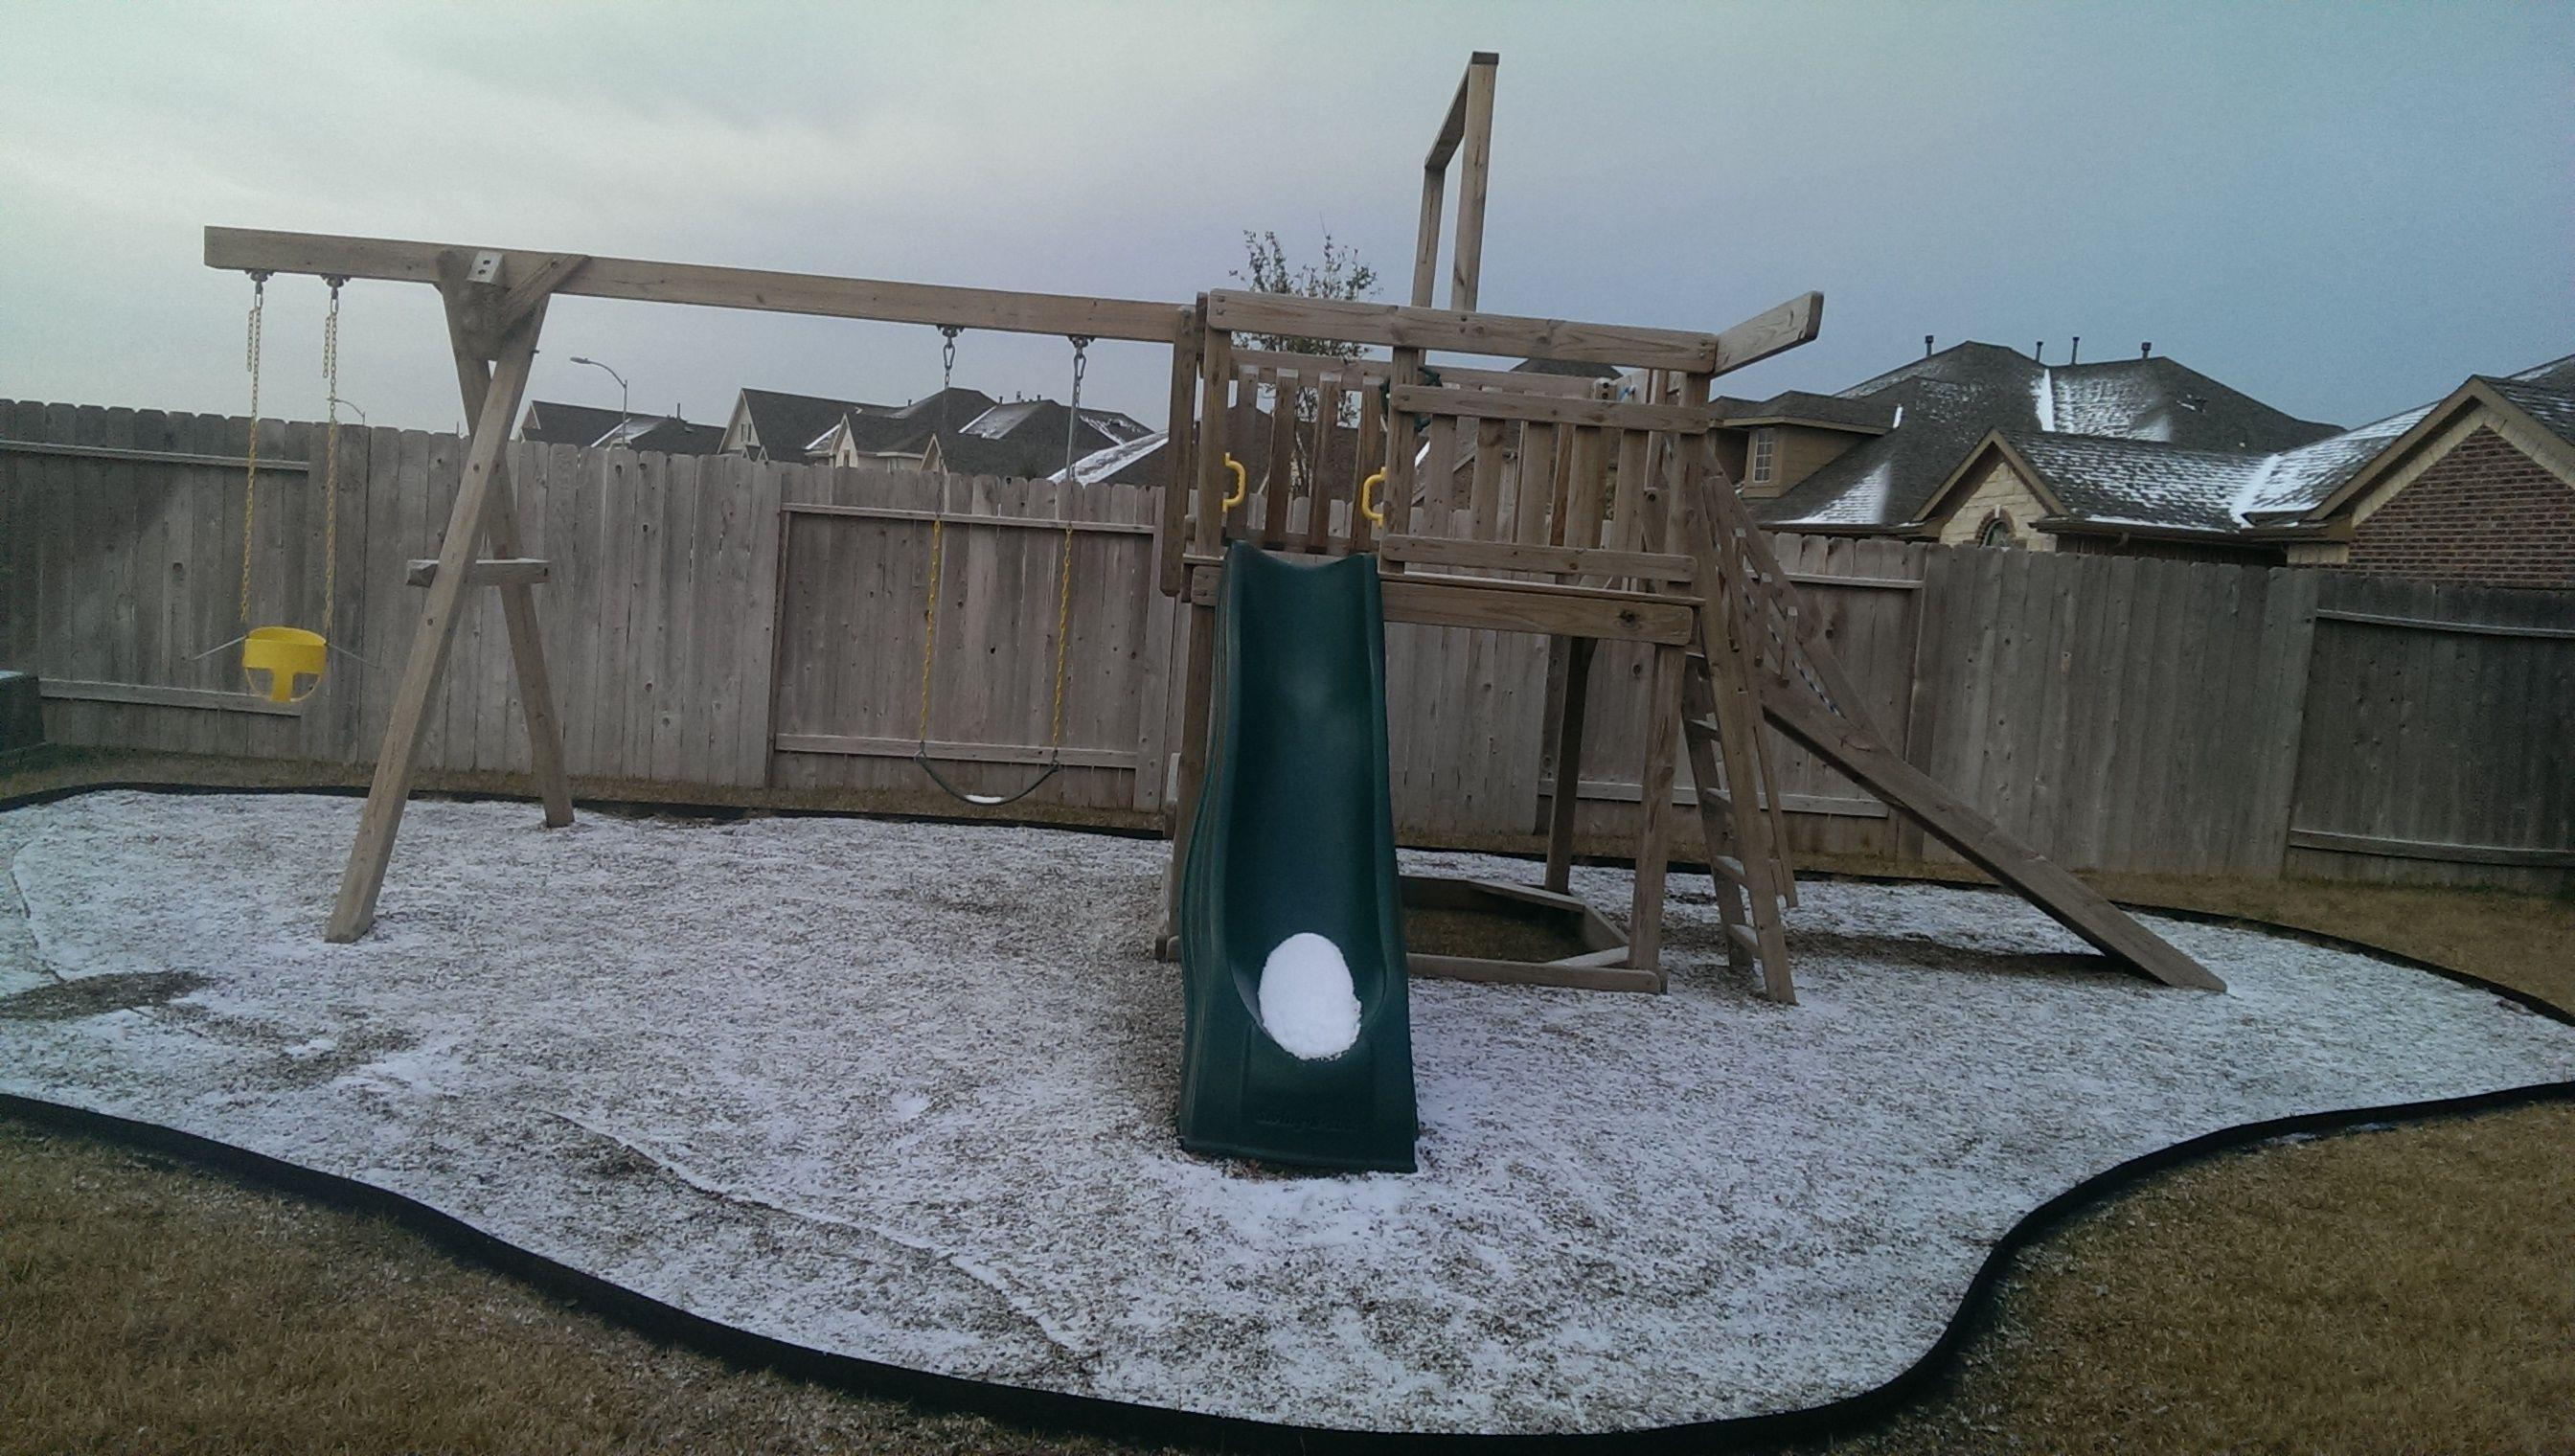 Backyard playground landscaping diy with ecoborder